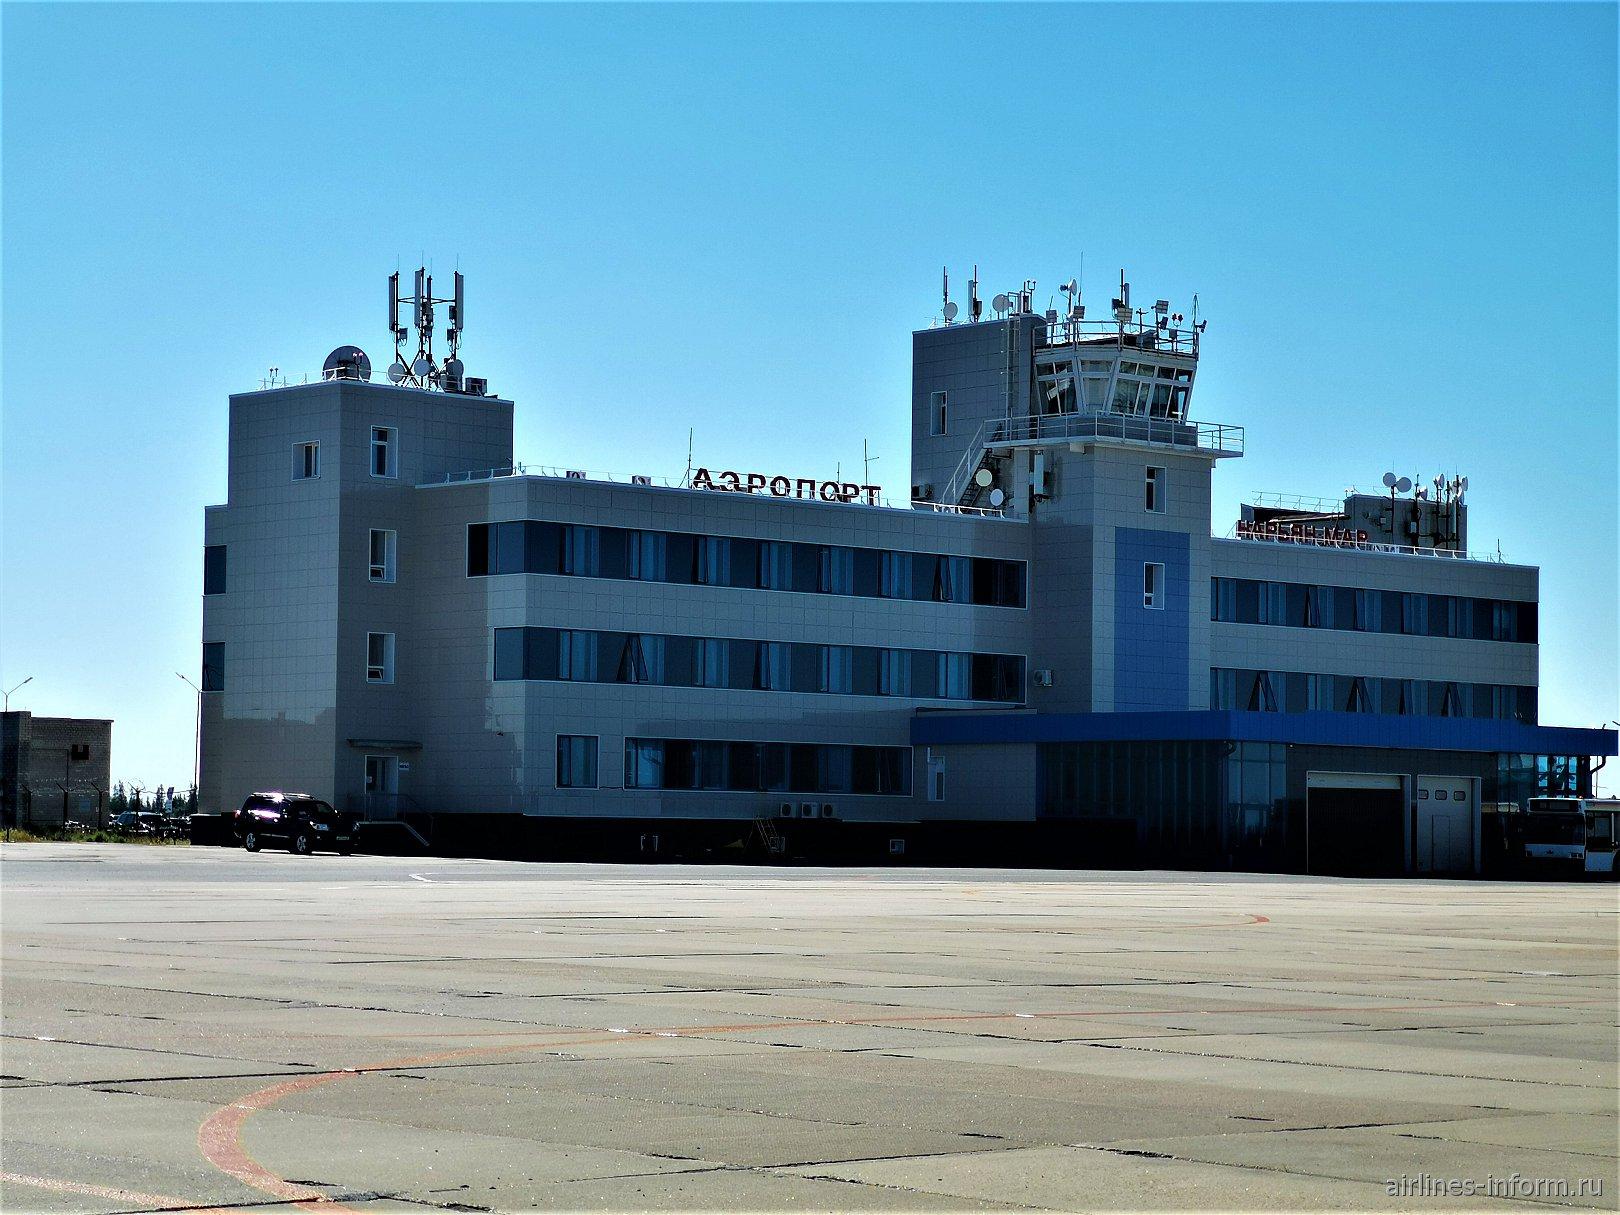 Вид с перрона на аэровокзал аэропорта Нарьян-Мар